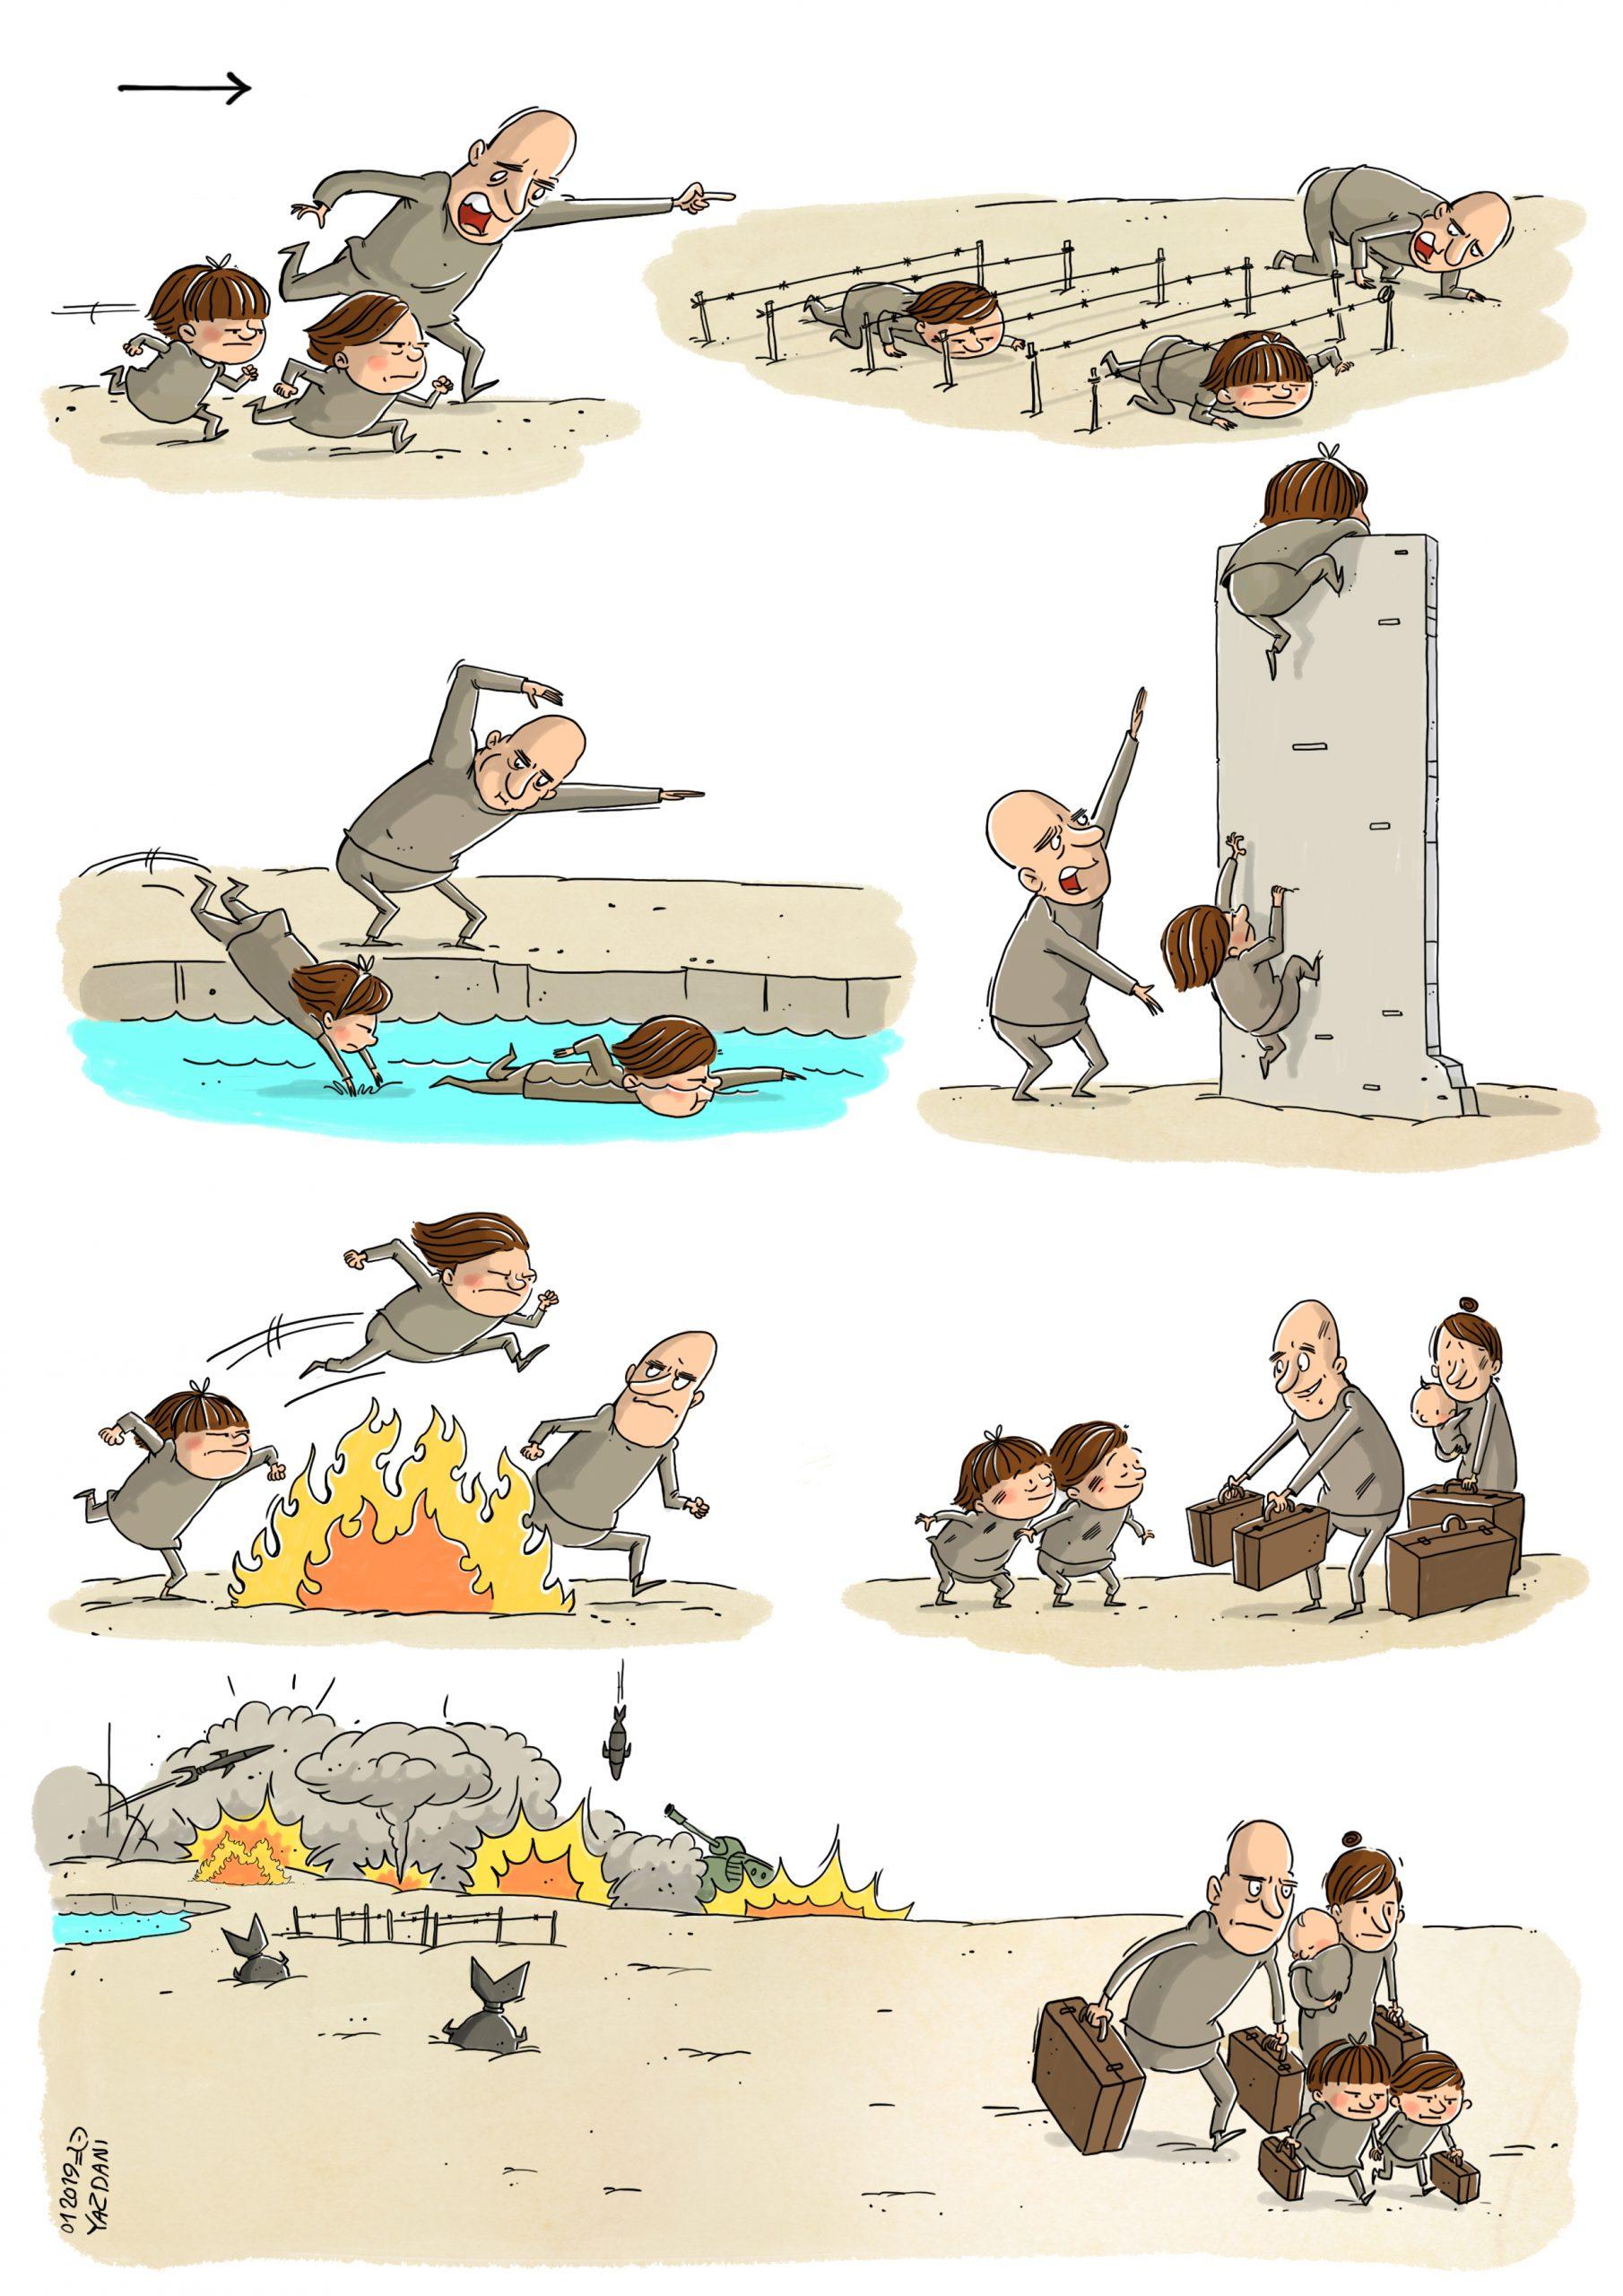 Mahnaz Yazdani, a vibrant & inspiring cartoonist